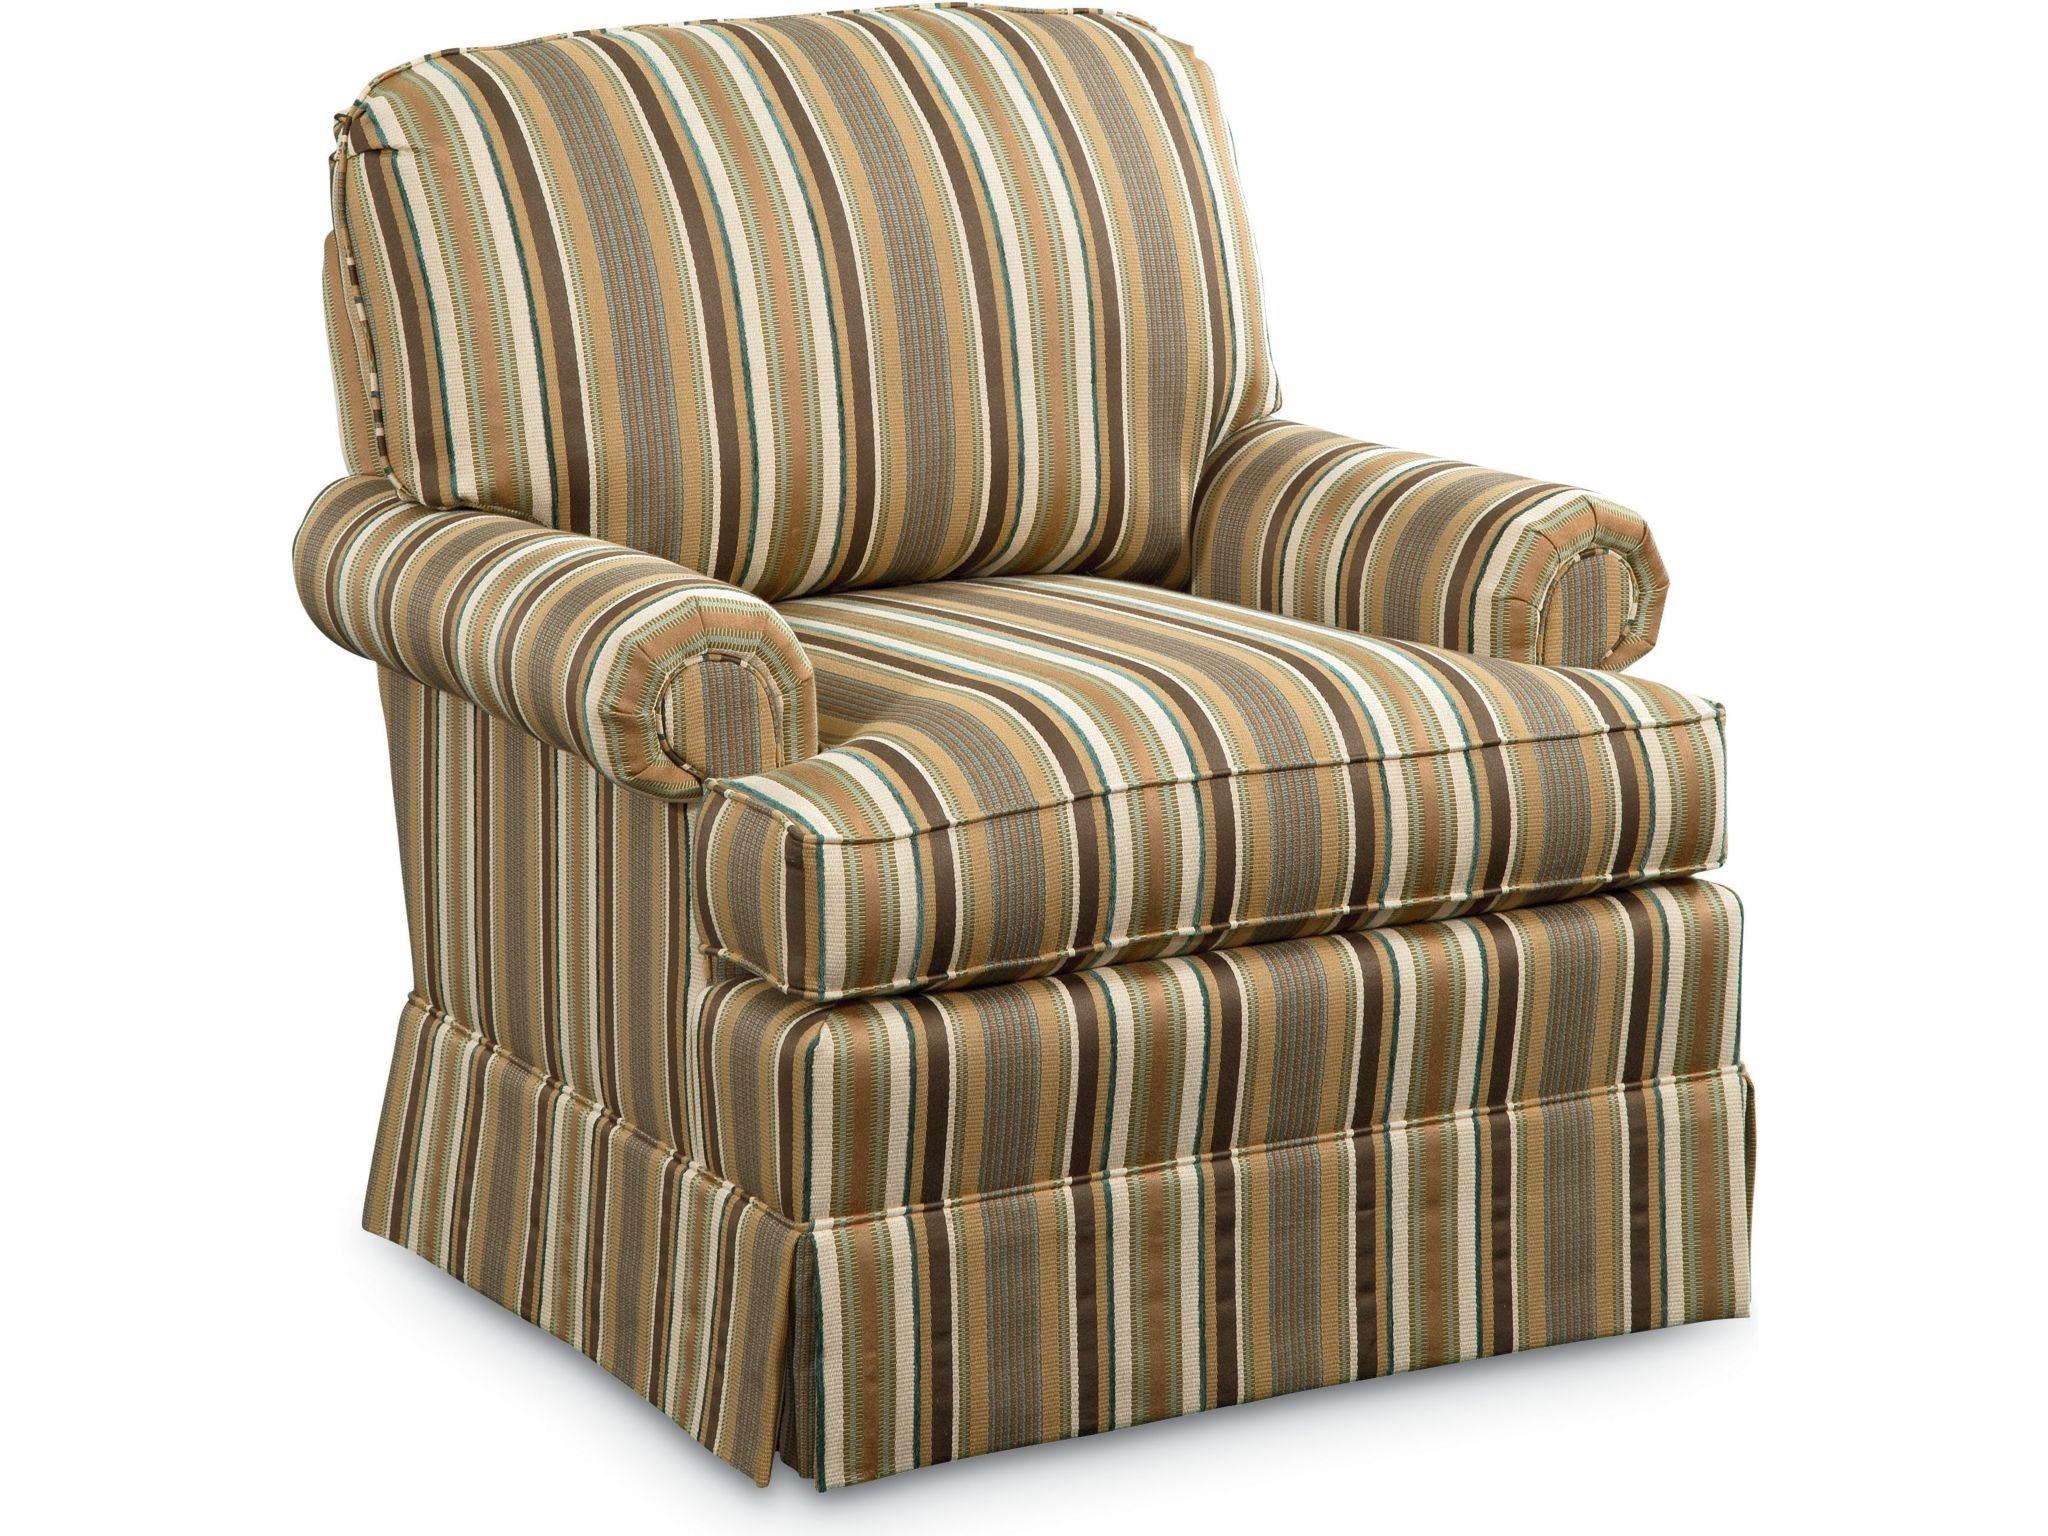 Thomasville Atlantis Swivel Rocker Chair 1052 15SR